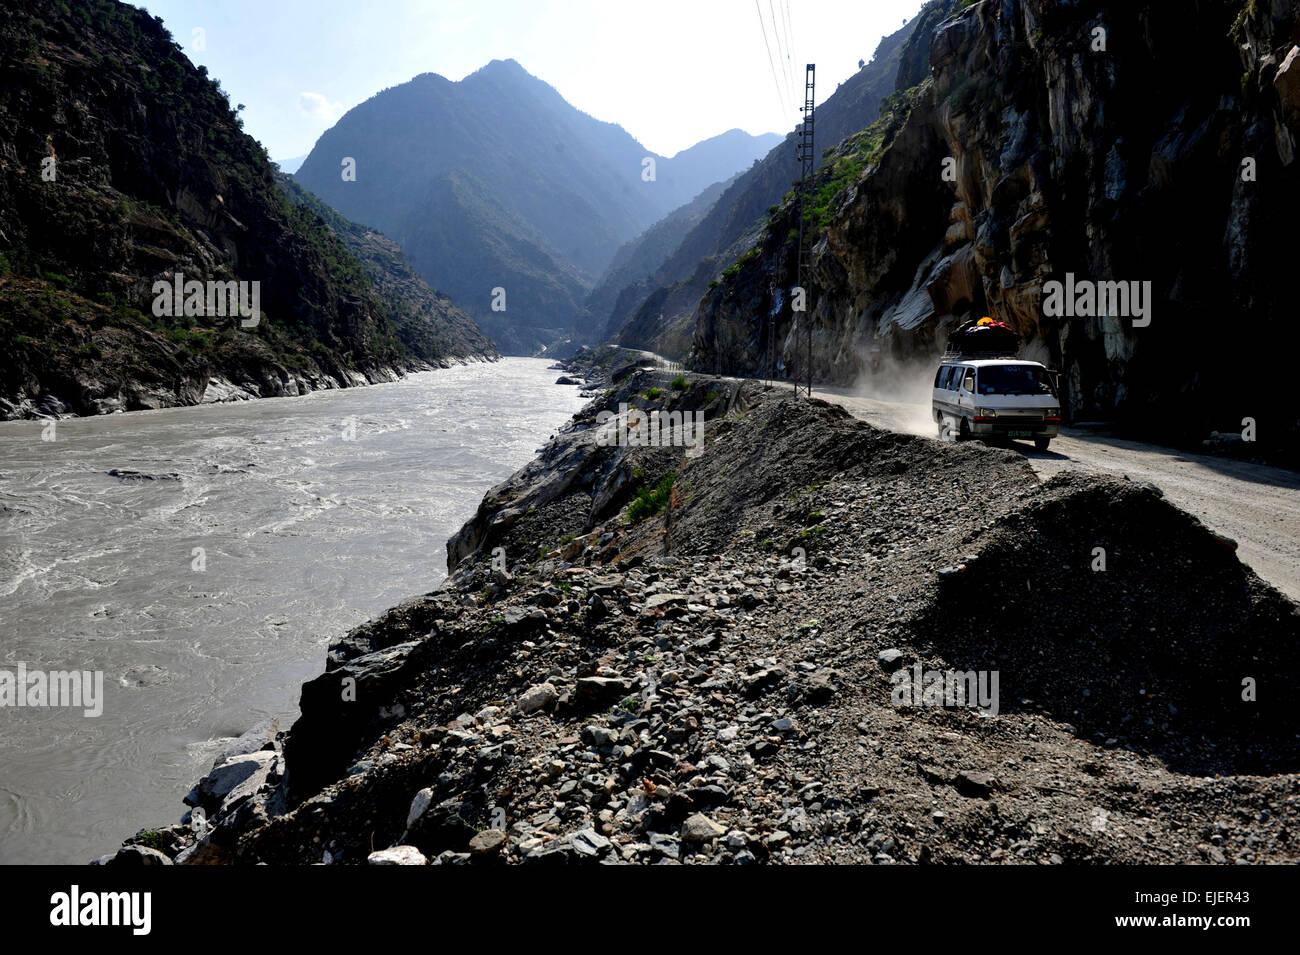 Karakoram Highway ,Pakistan, Gilgit, Baltistan, - Stock Image